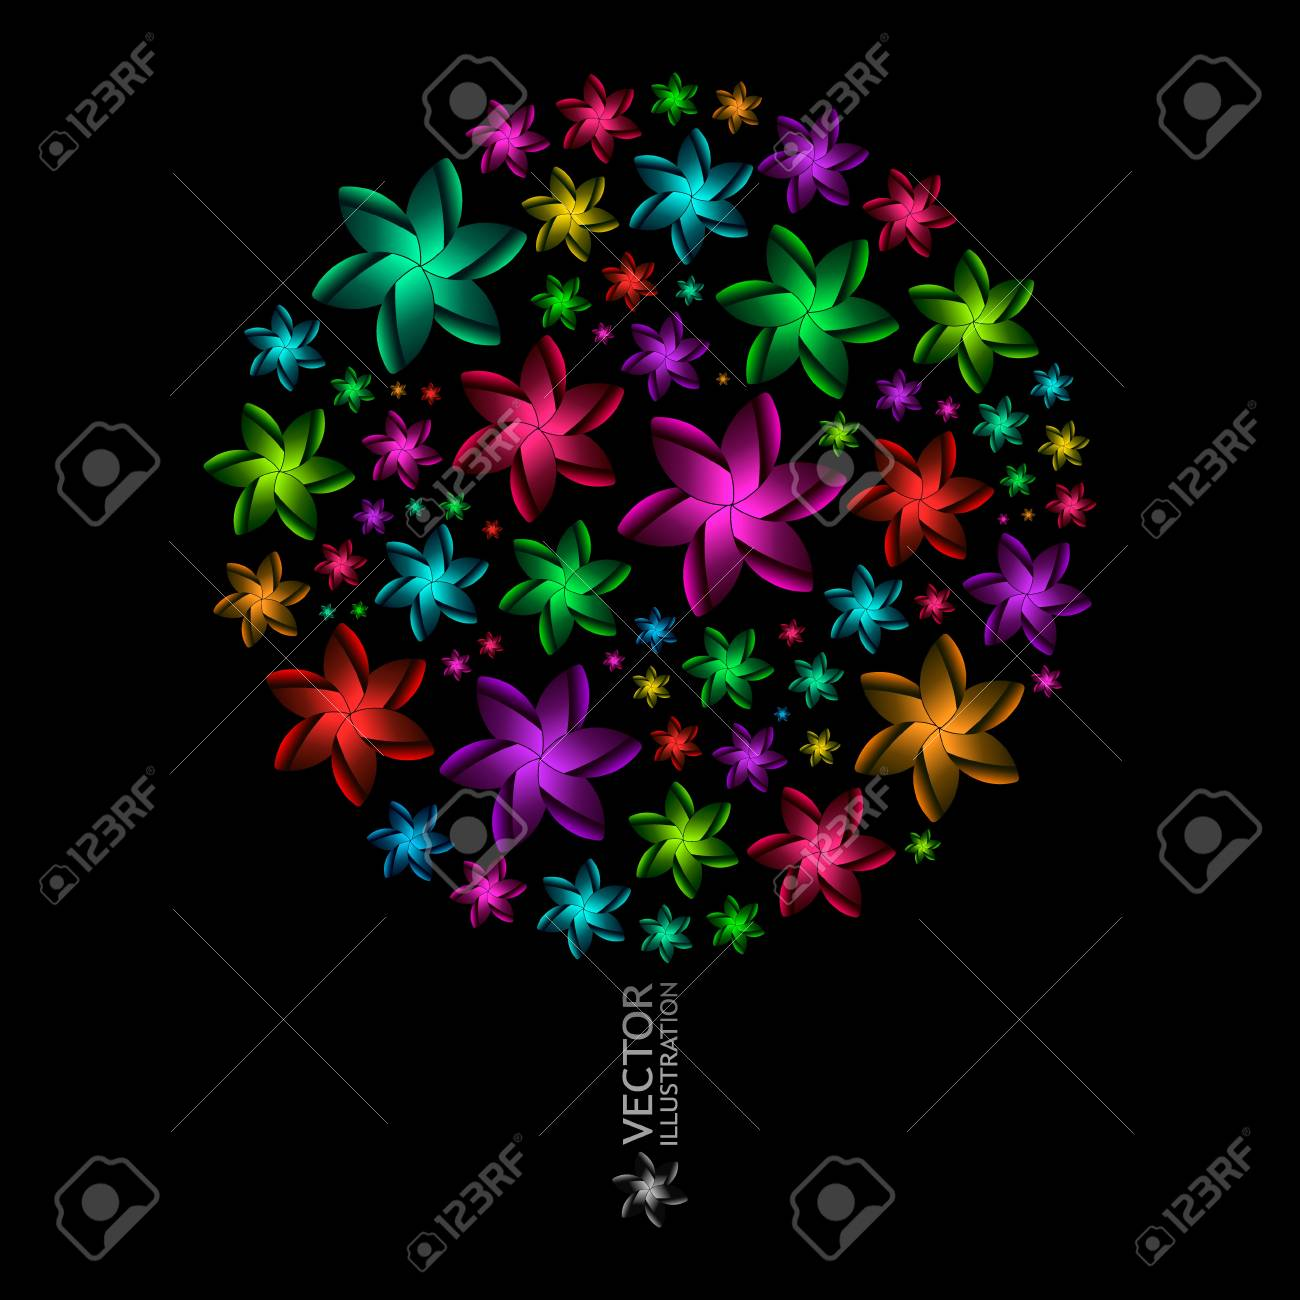 Floral illustration. Stock Vector - 11888300